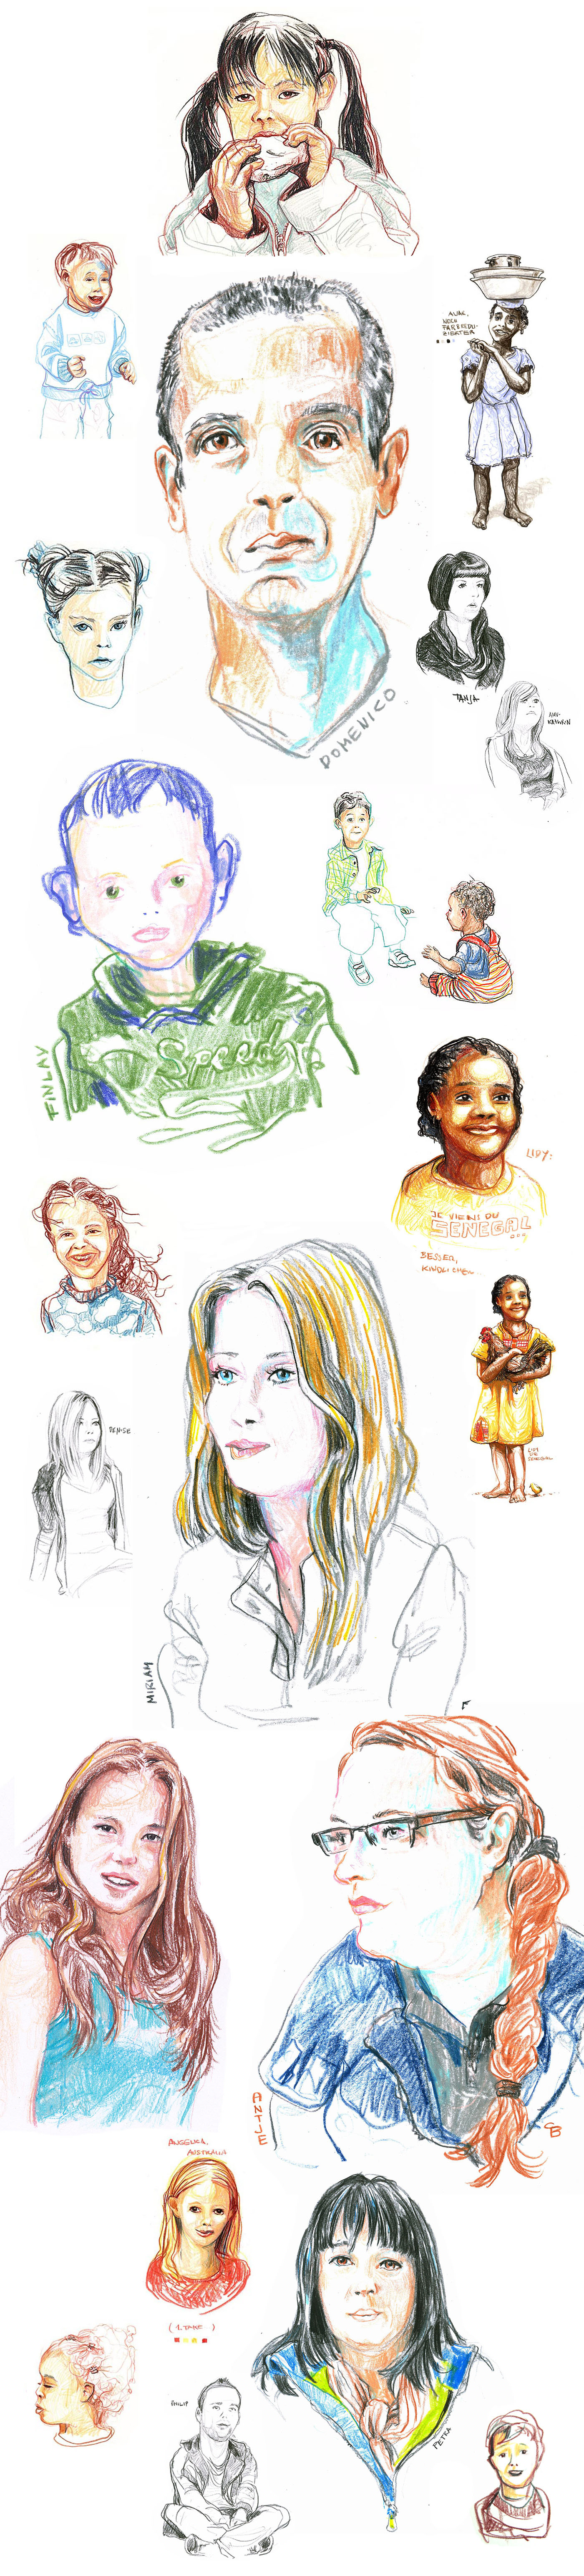 collage,Drawing ,sketch,sketchbook,Editorial Illustration,people,portrait